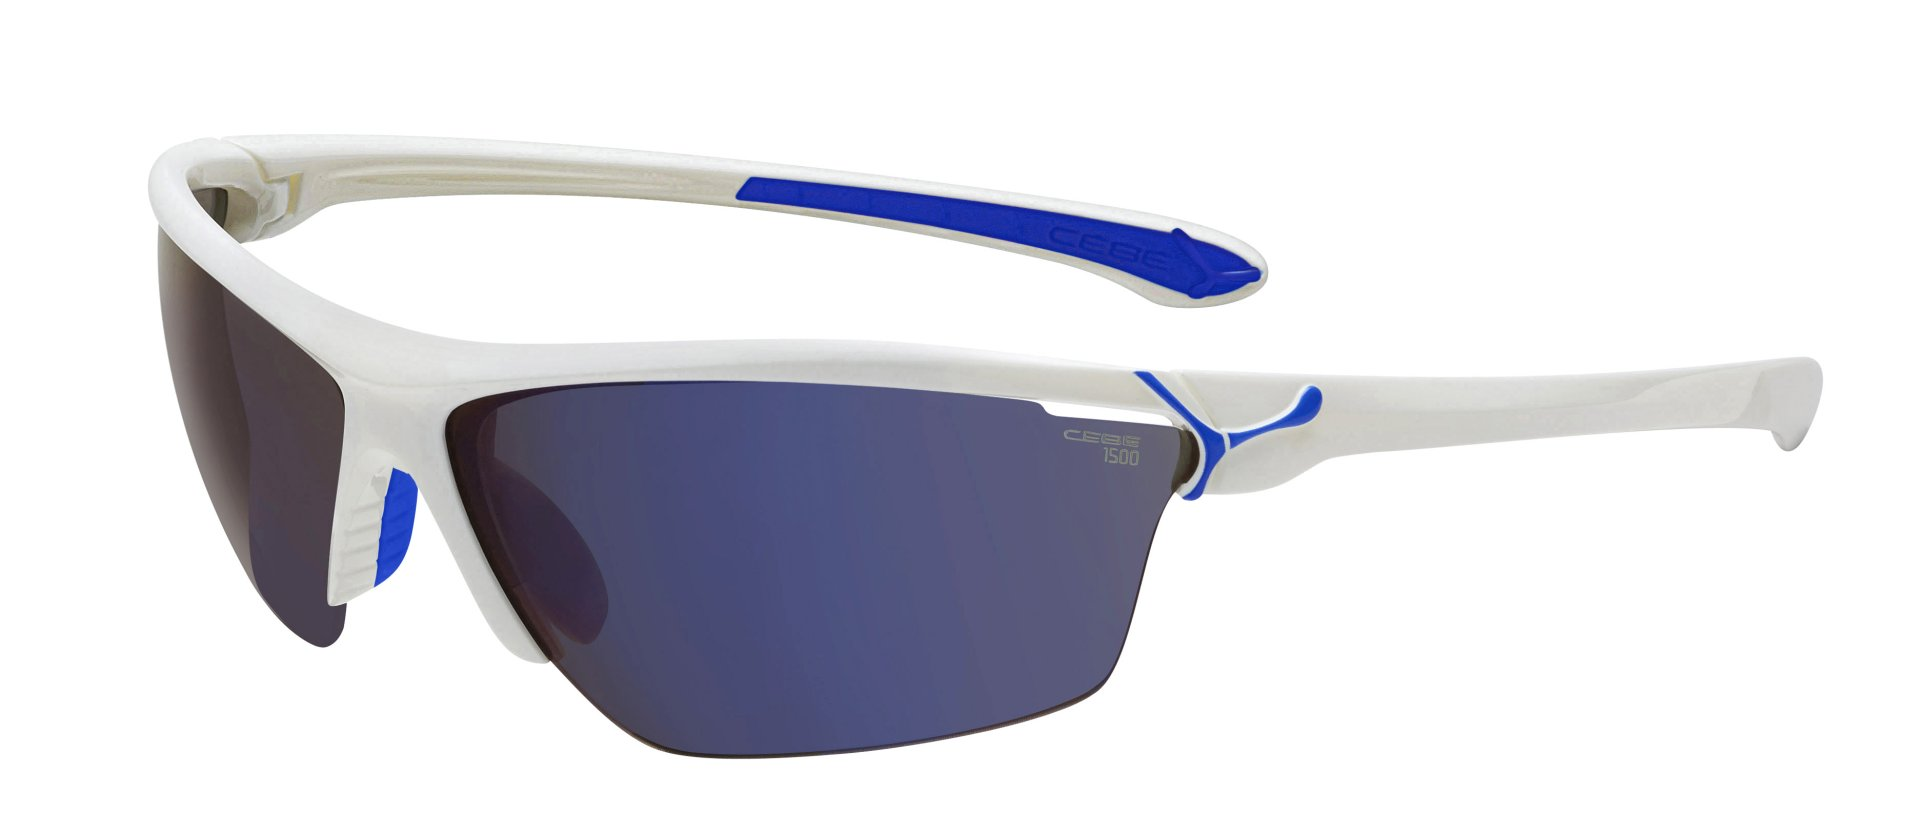 CEBE Cinetik CBCINETIK6 Sonnenbrille Sportbrille 1epVW63